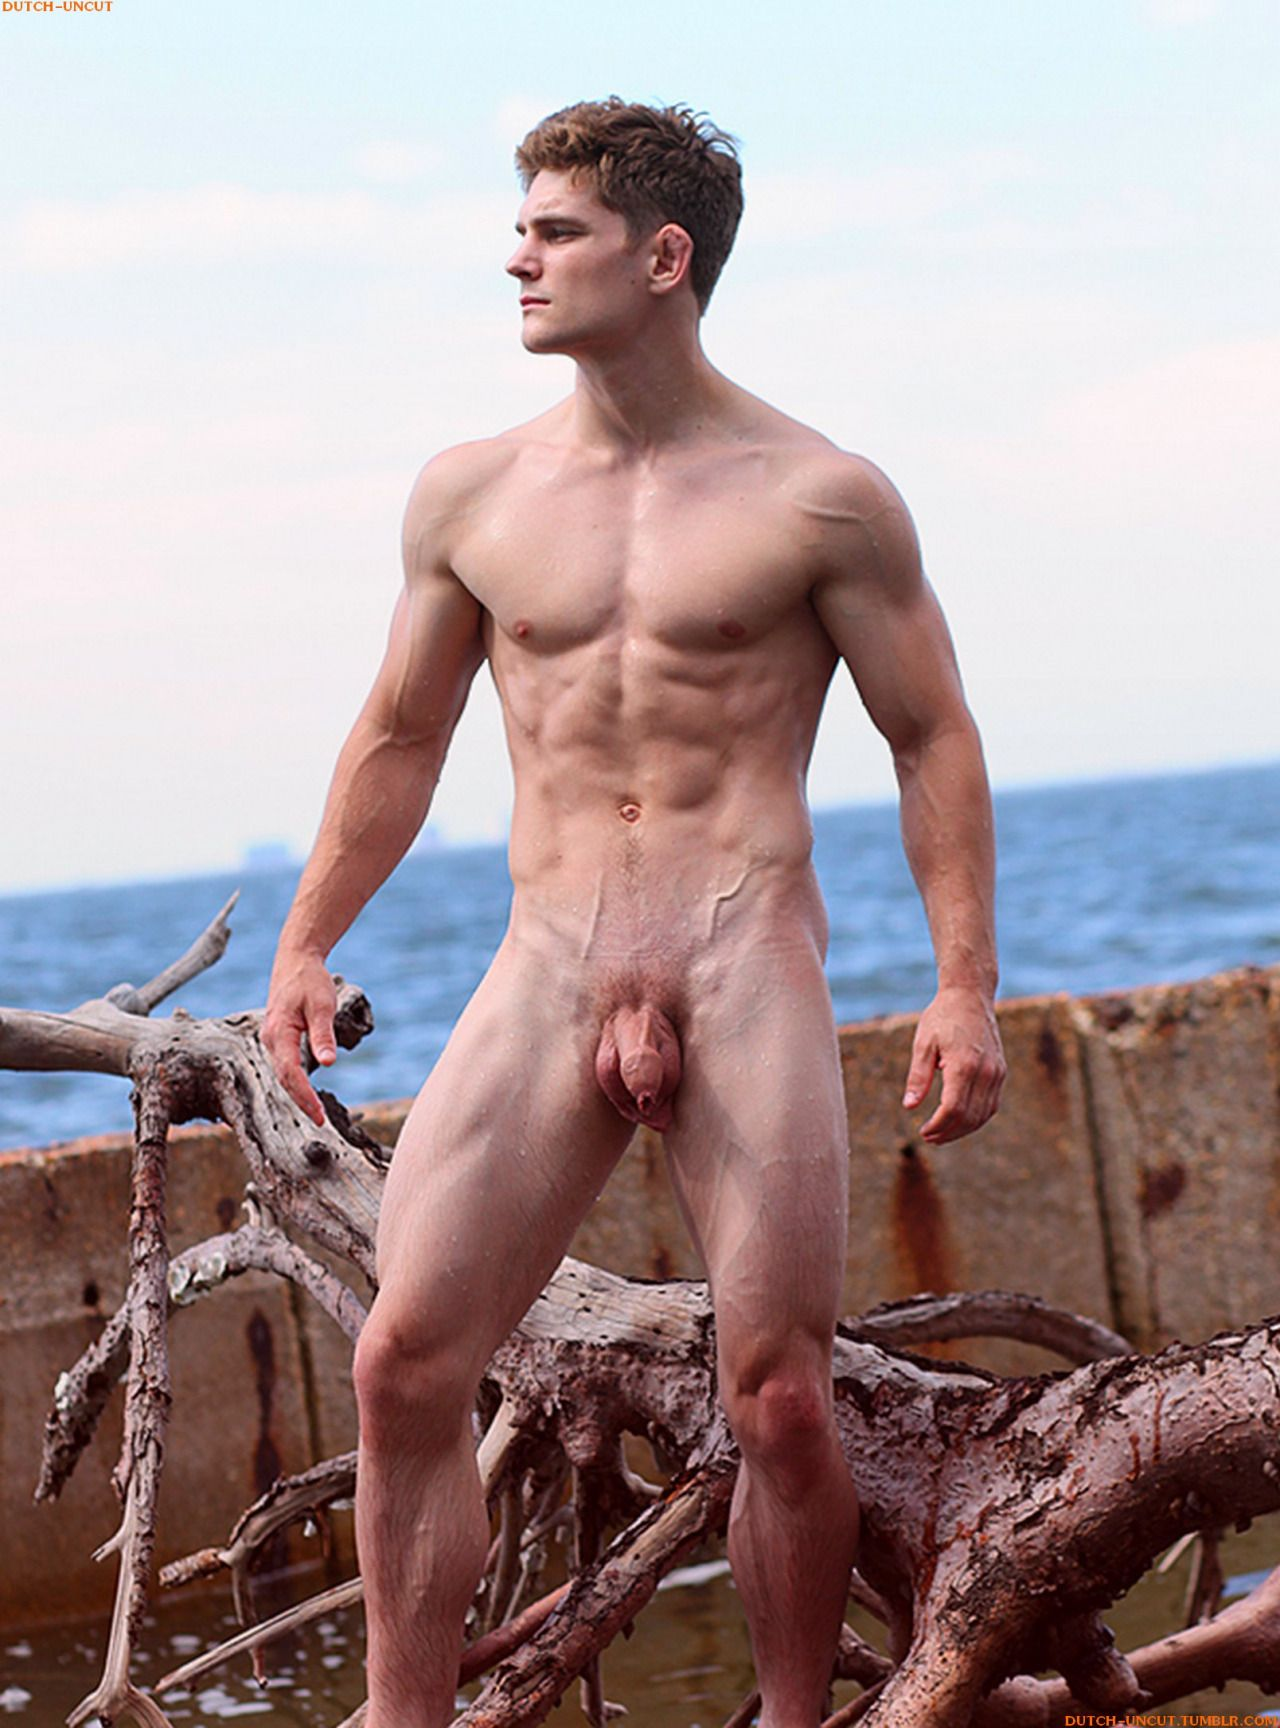 nude males dutch